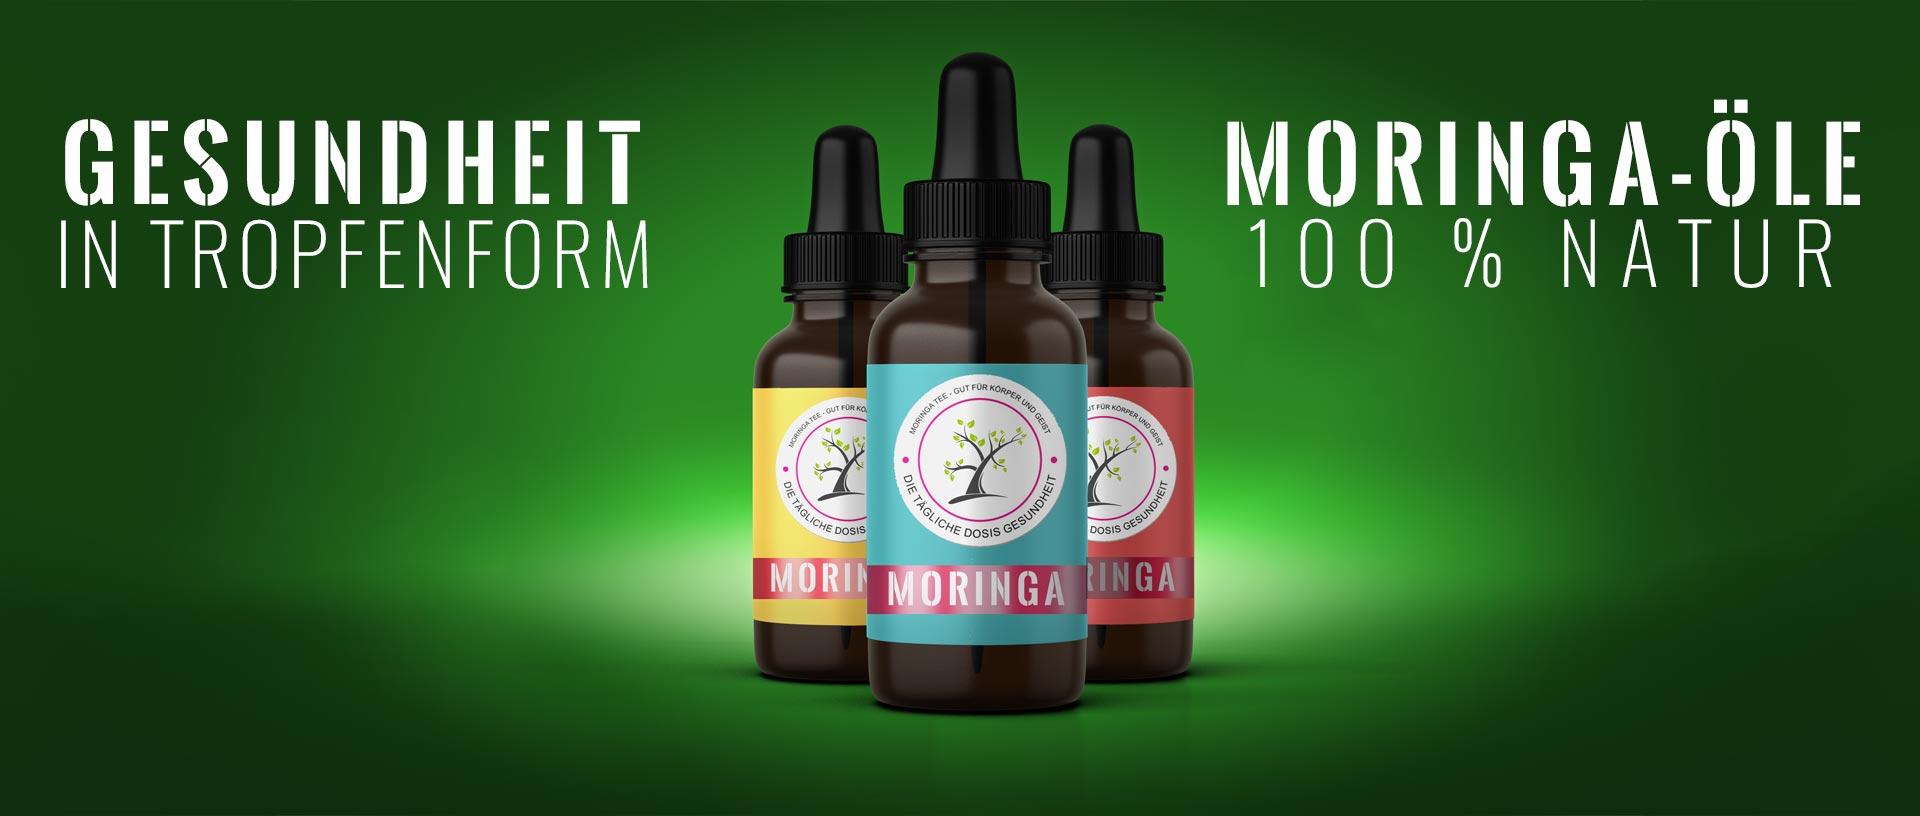 moringa-öl-kaufen-moringa-blätter